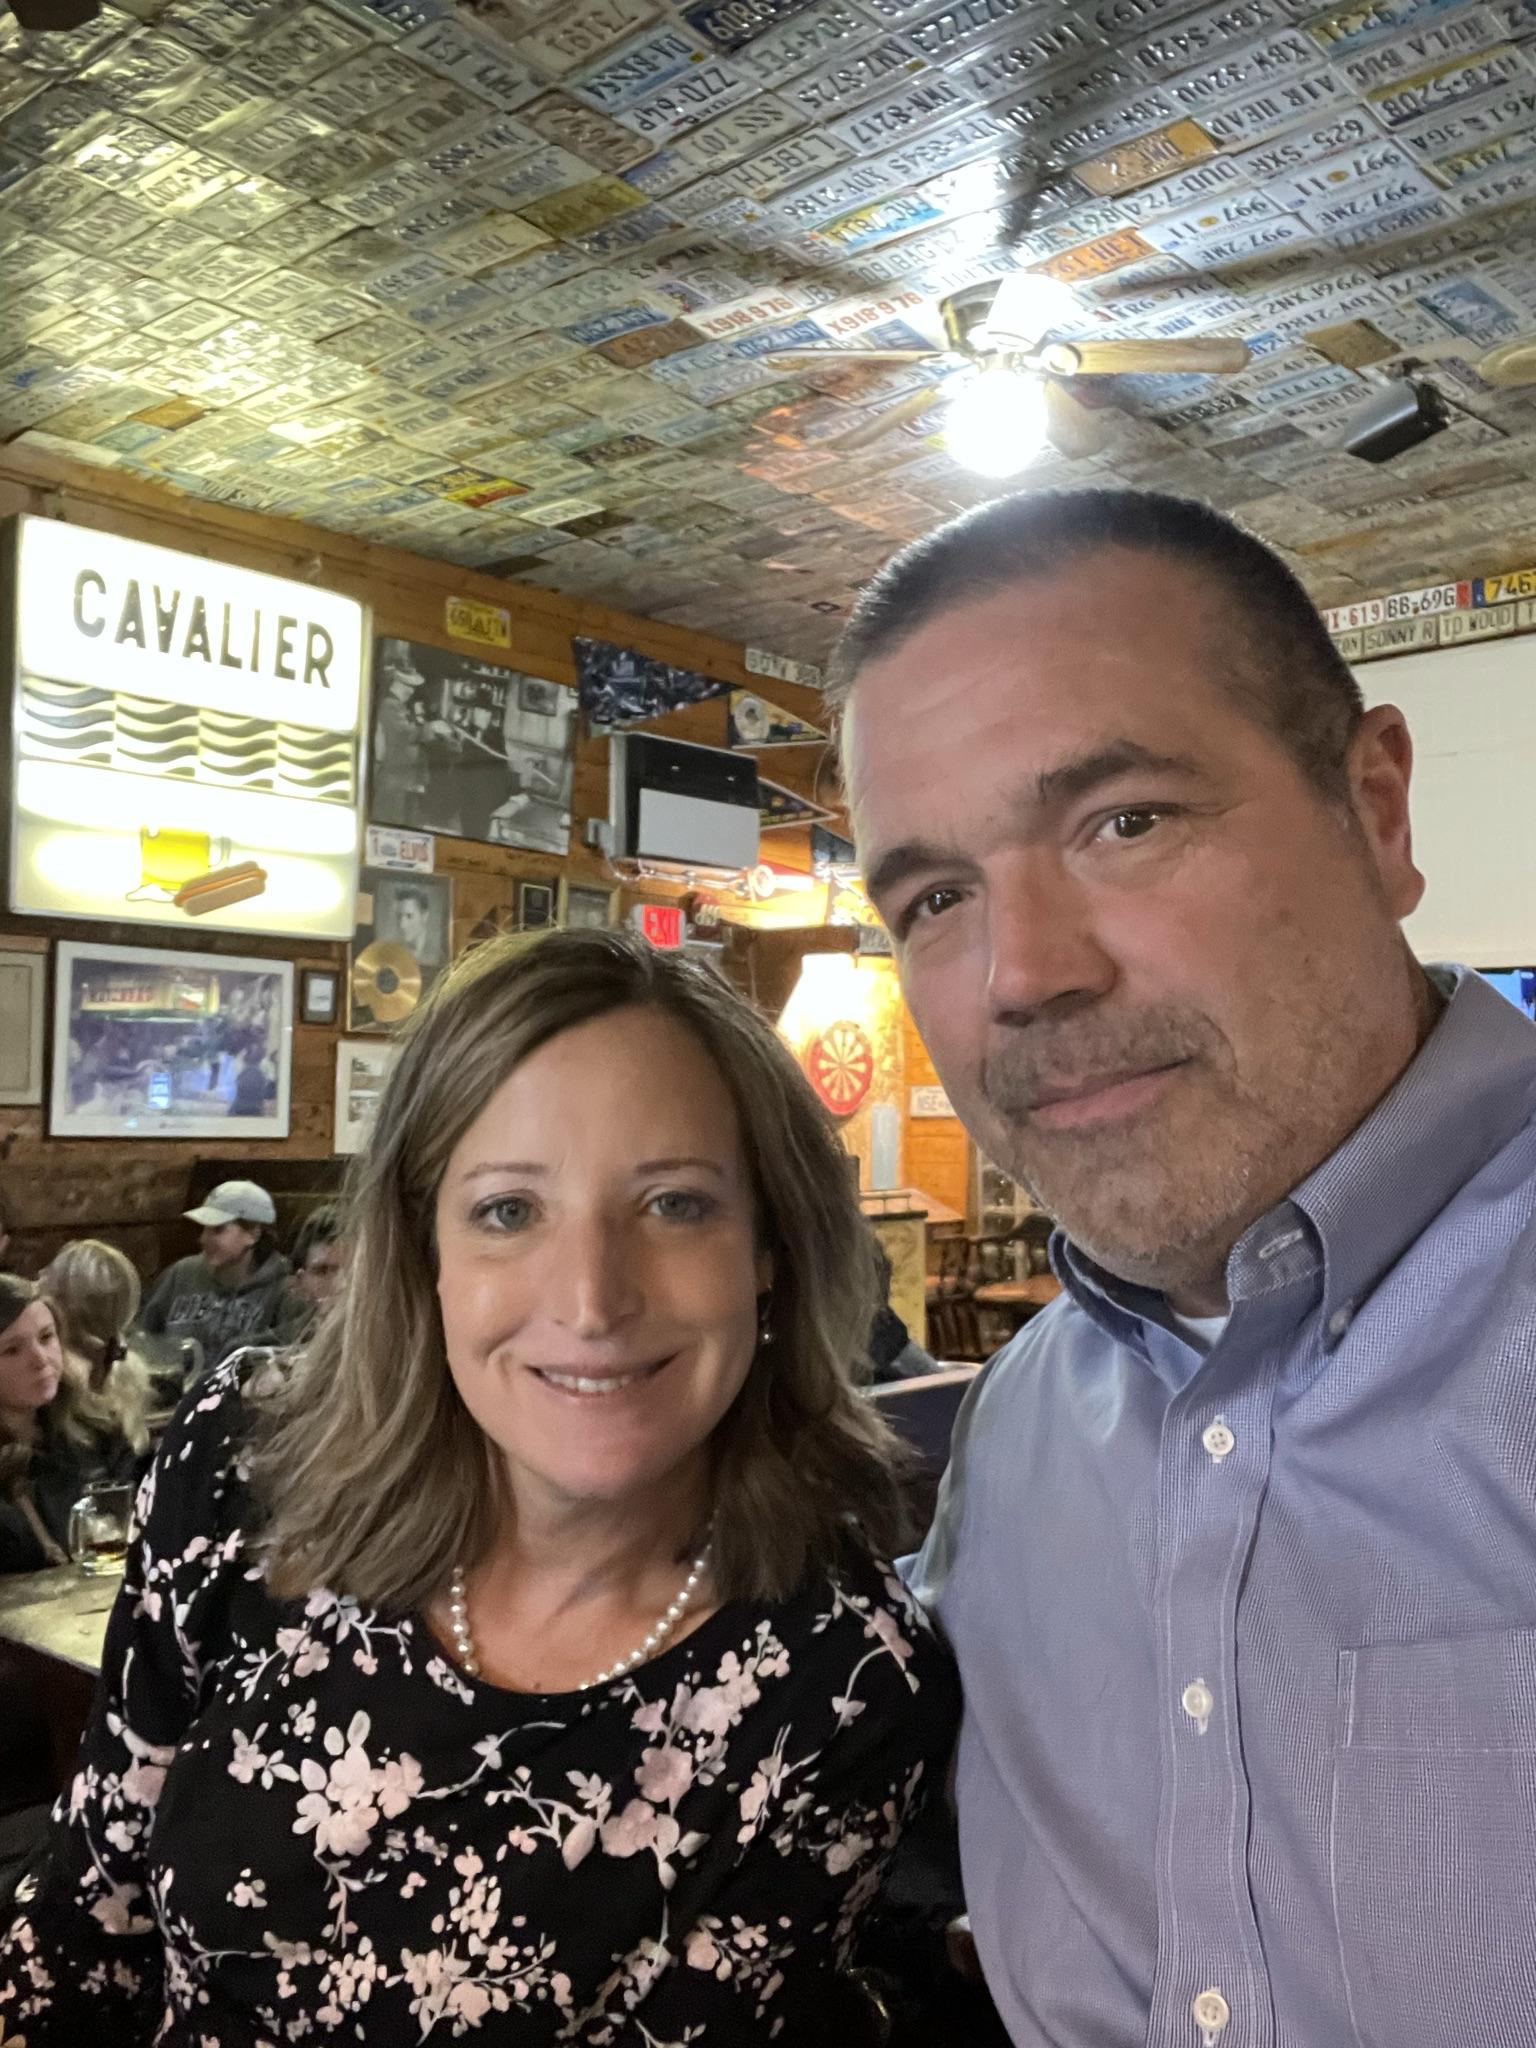 Eating at The Cavalier in Lynchburg, VA